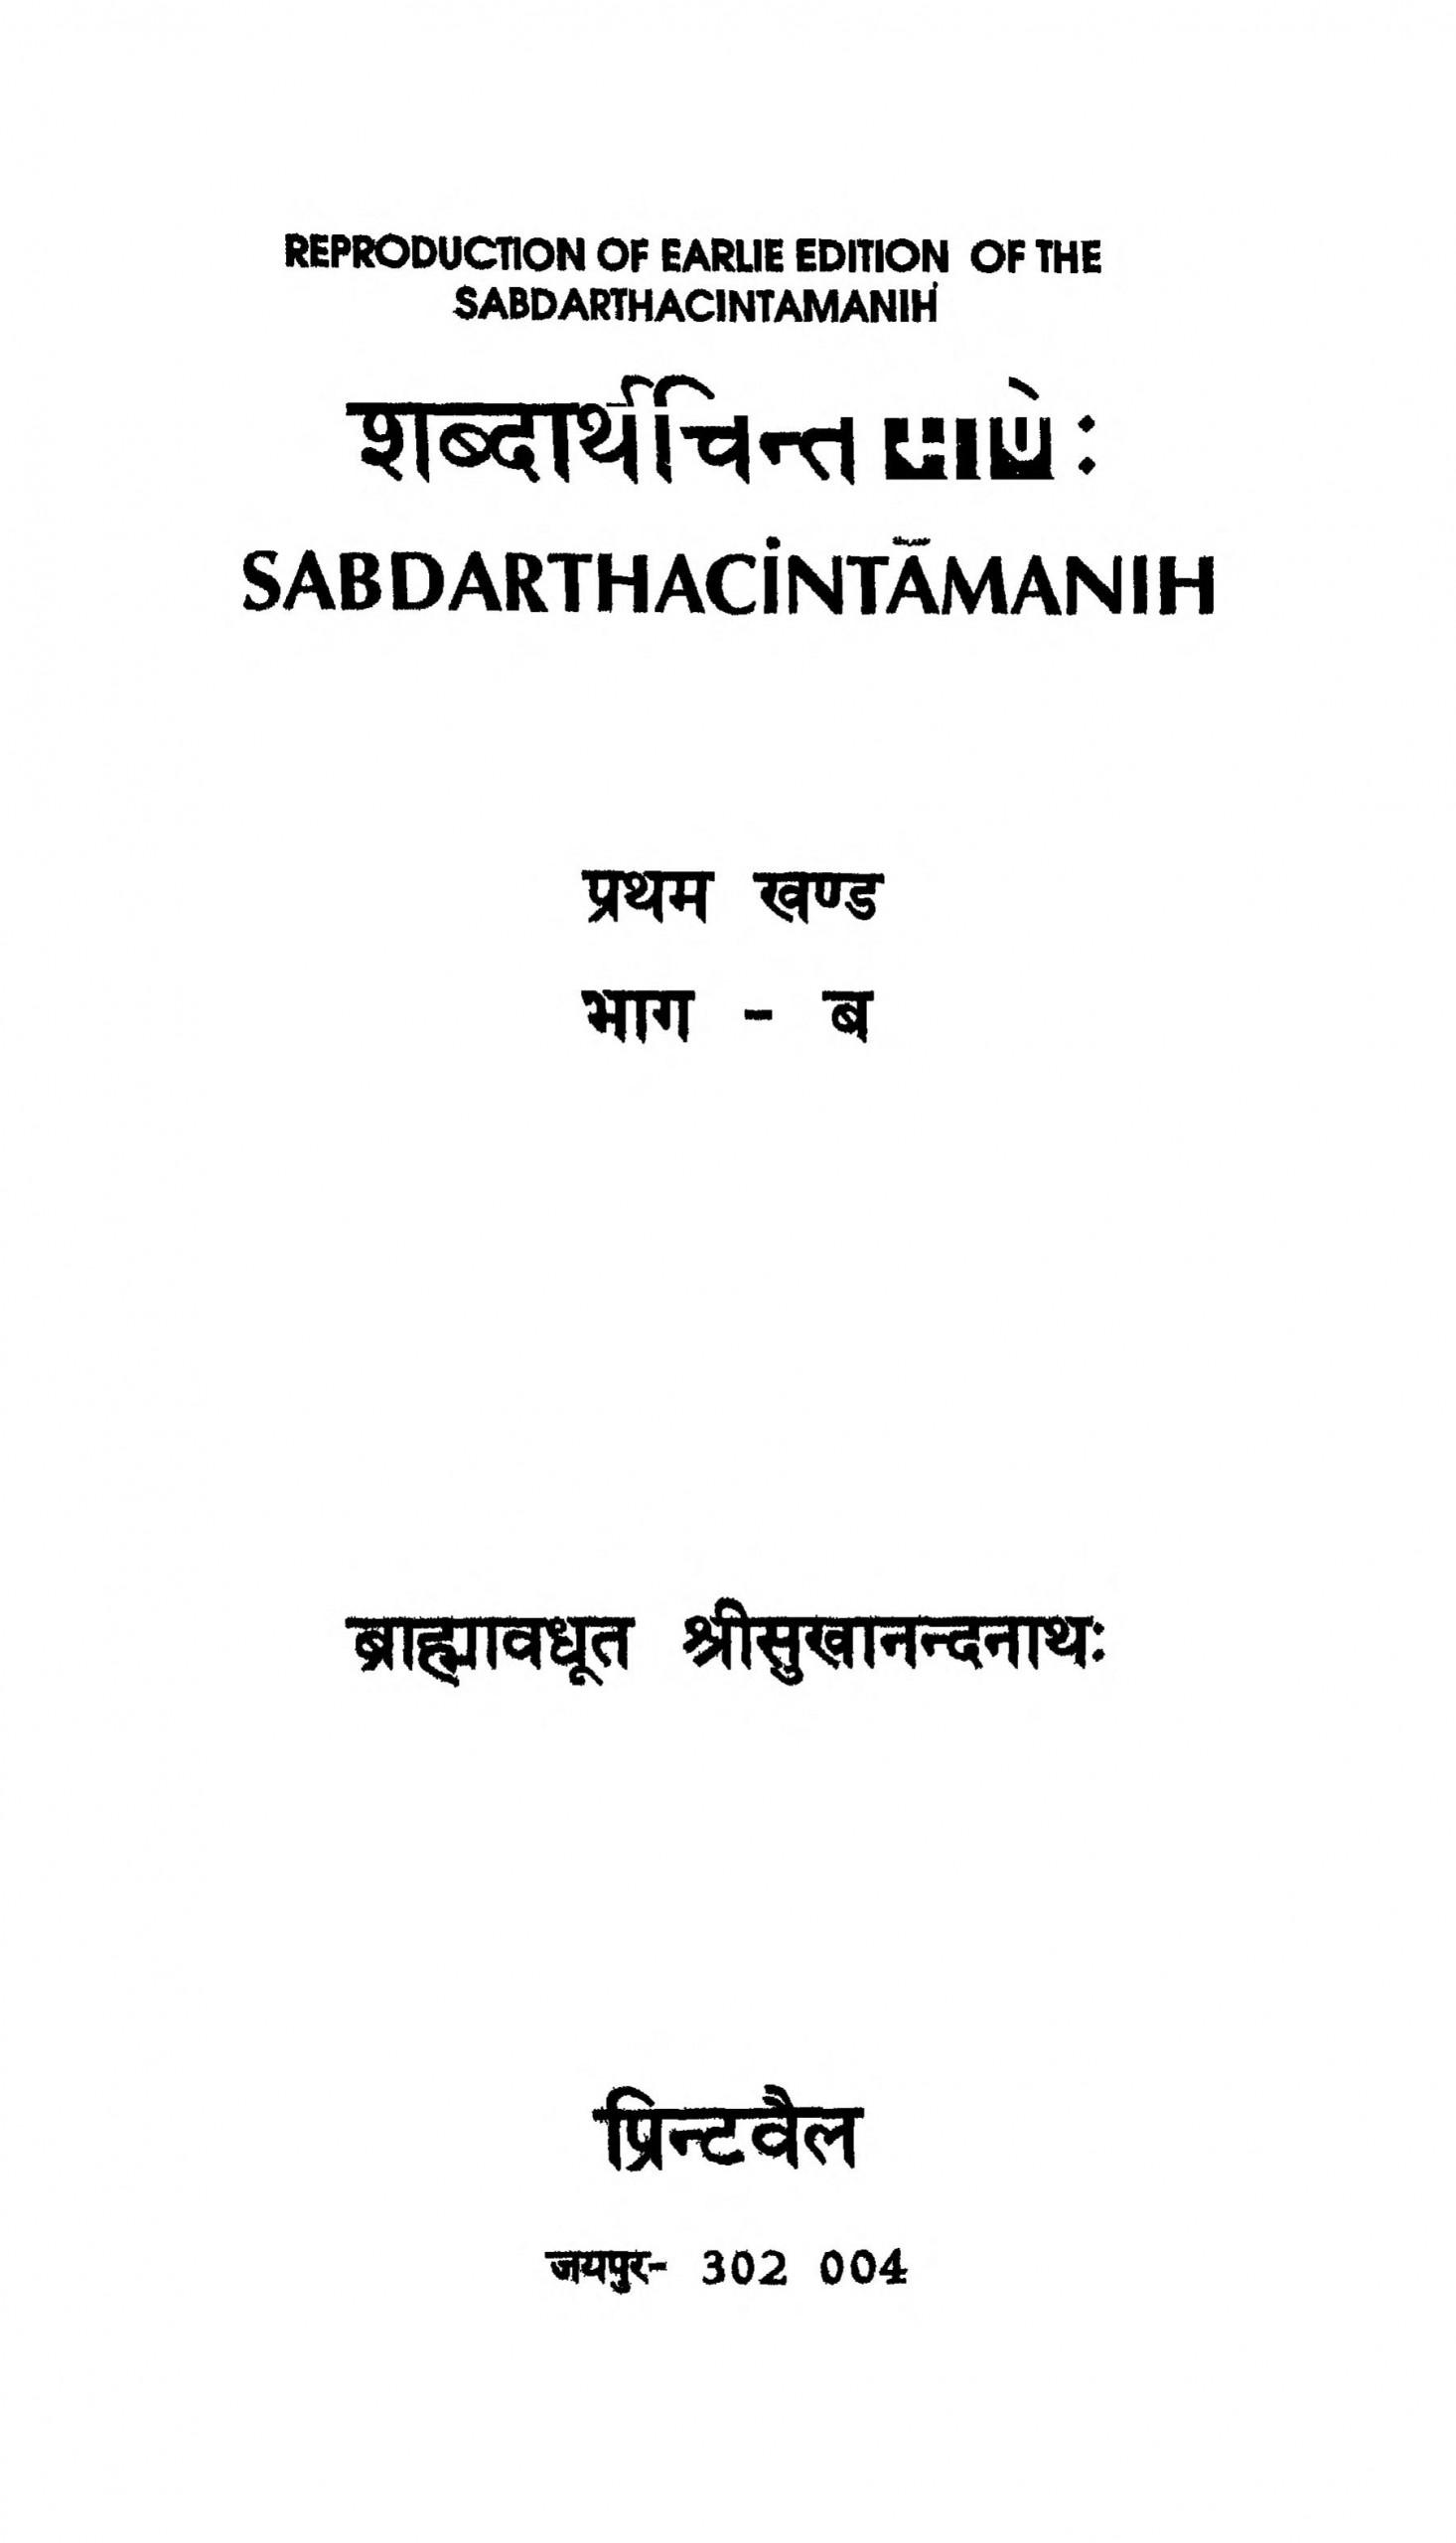 Book Image : शब्दार्थचिन्तामणि - Shabdarth Chintamani